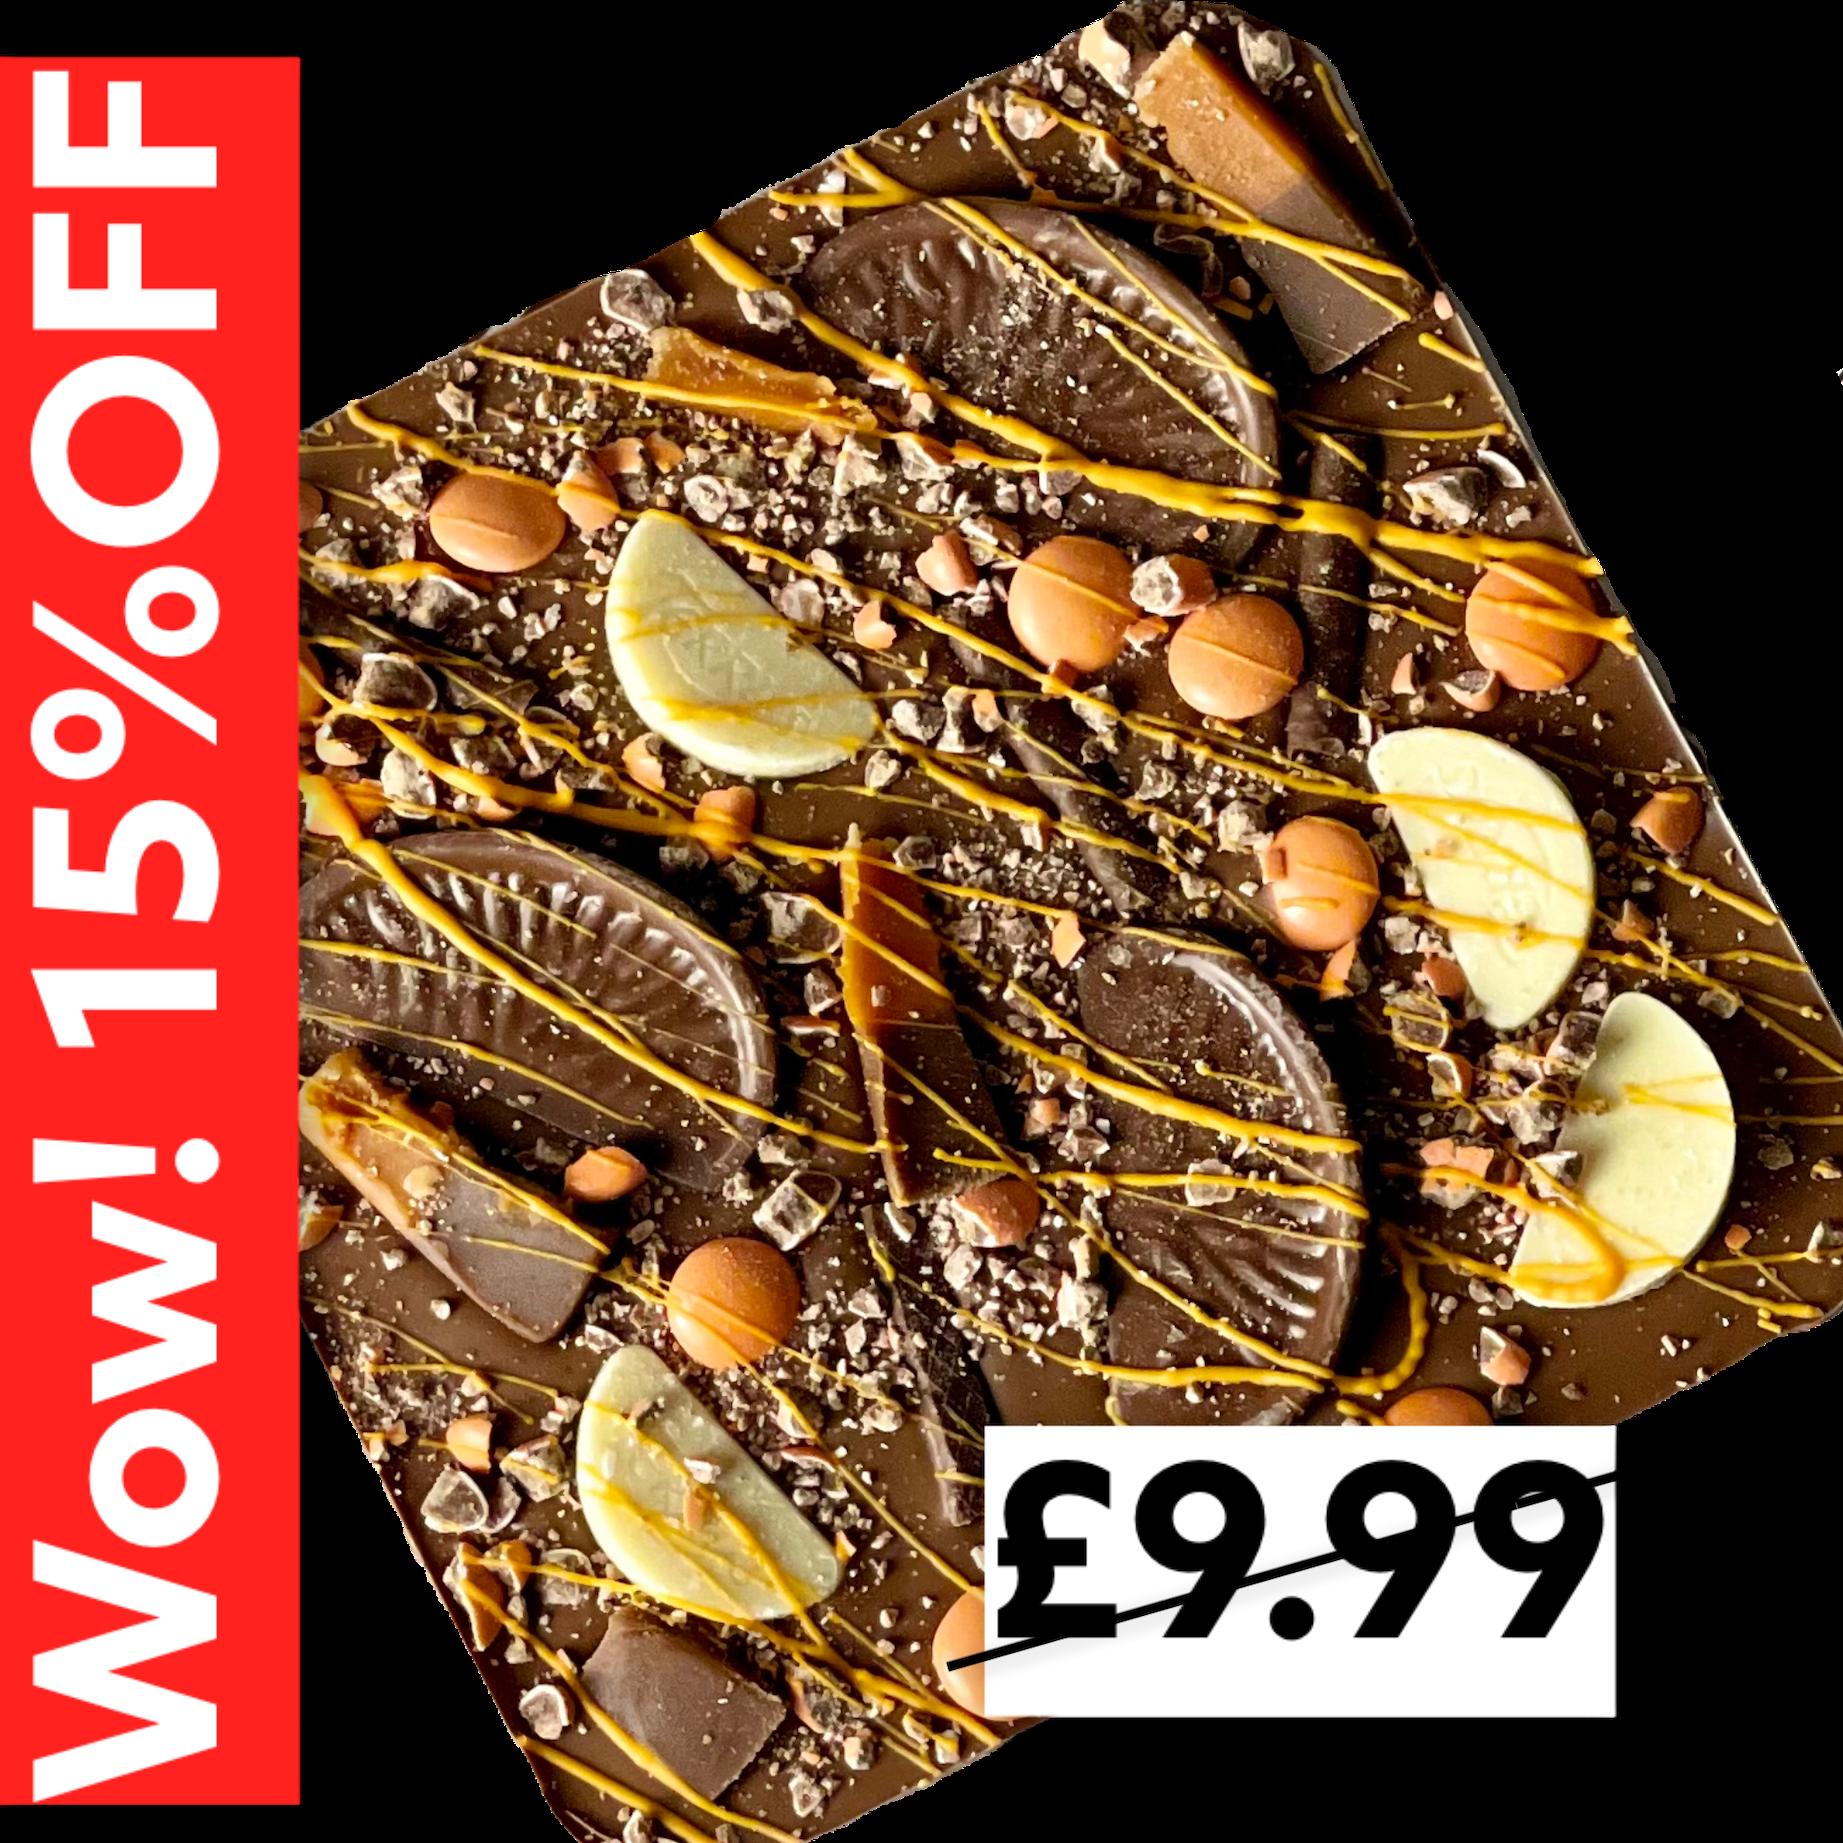 Chocolate Slab - Chocolate Orange